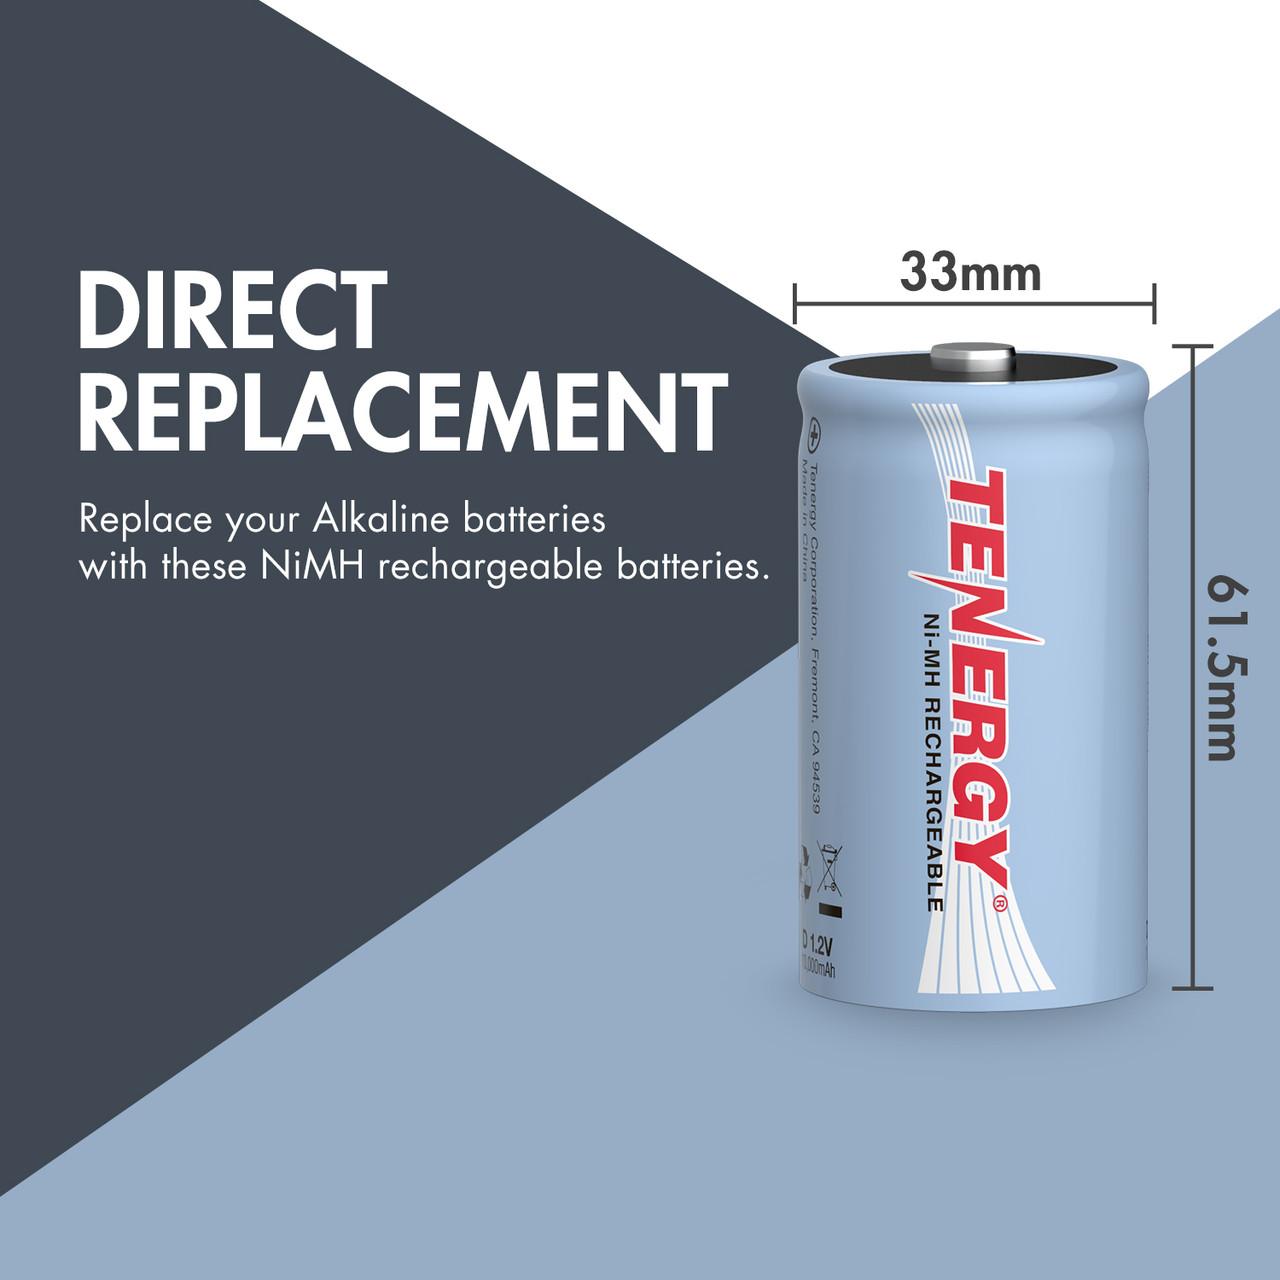 Tenergy D 10,000mAh NiMH Rechargeable Battery 16pcs